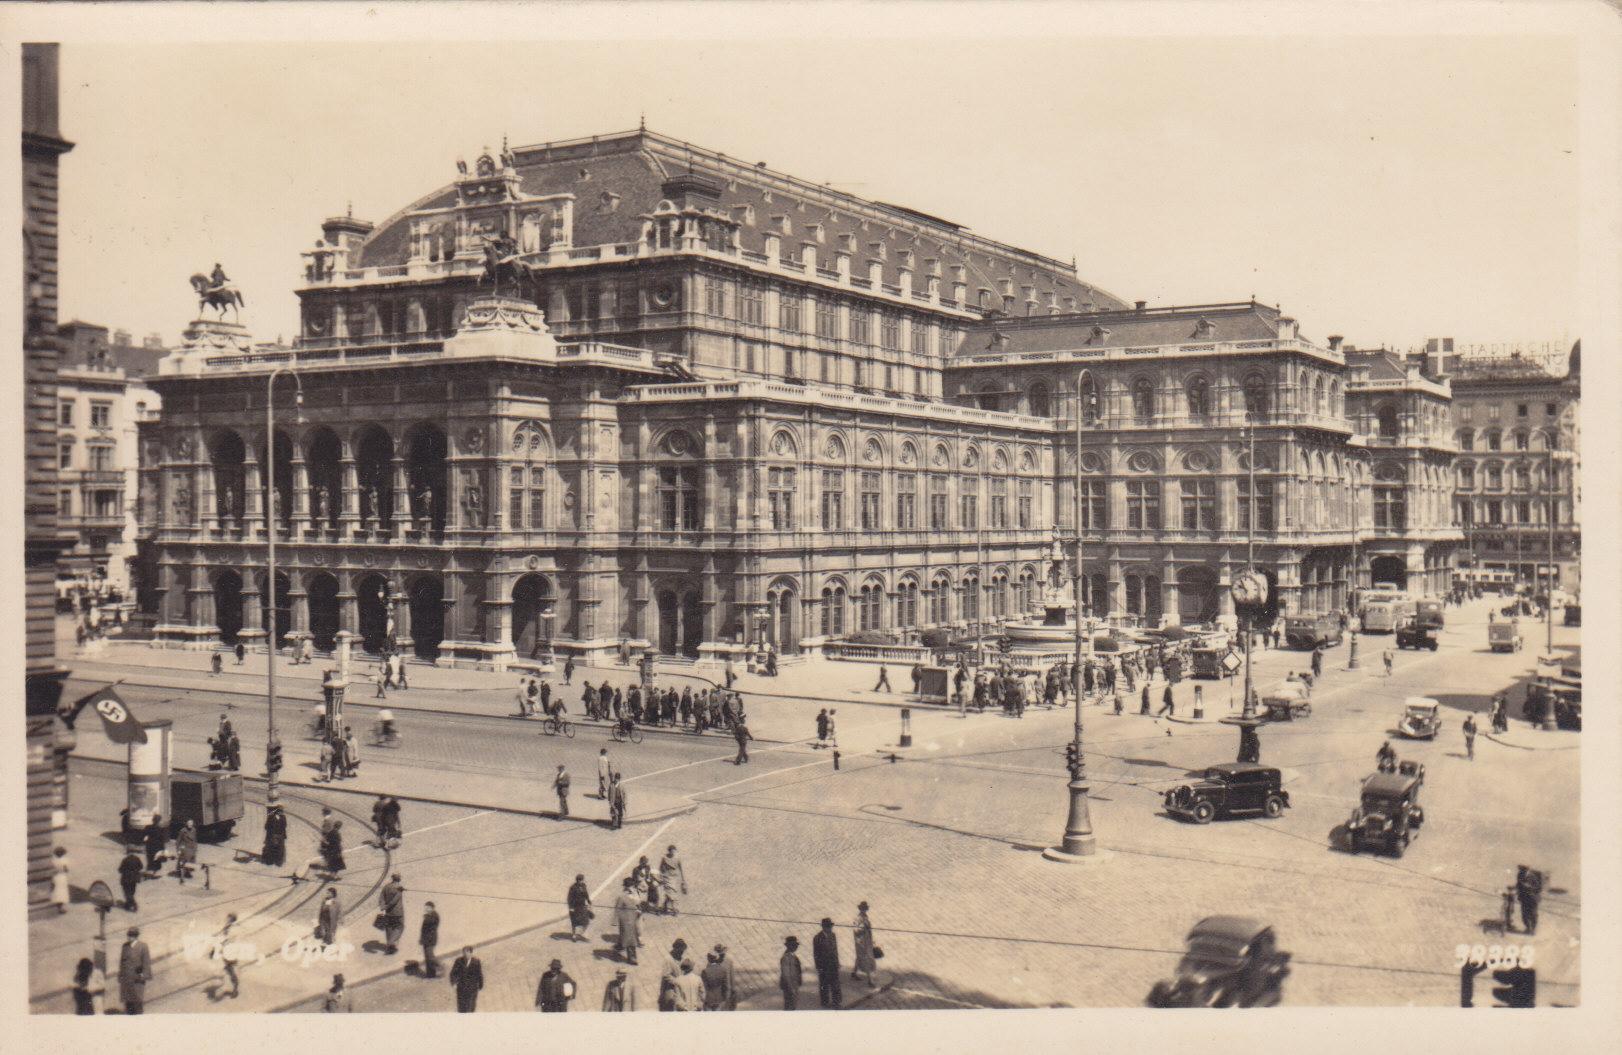 C'era una volta Vienna